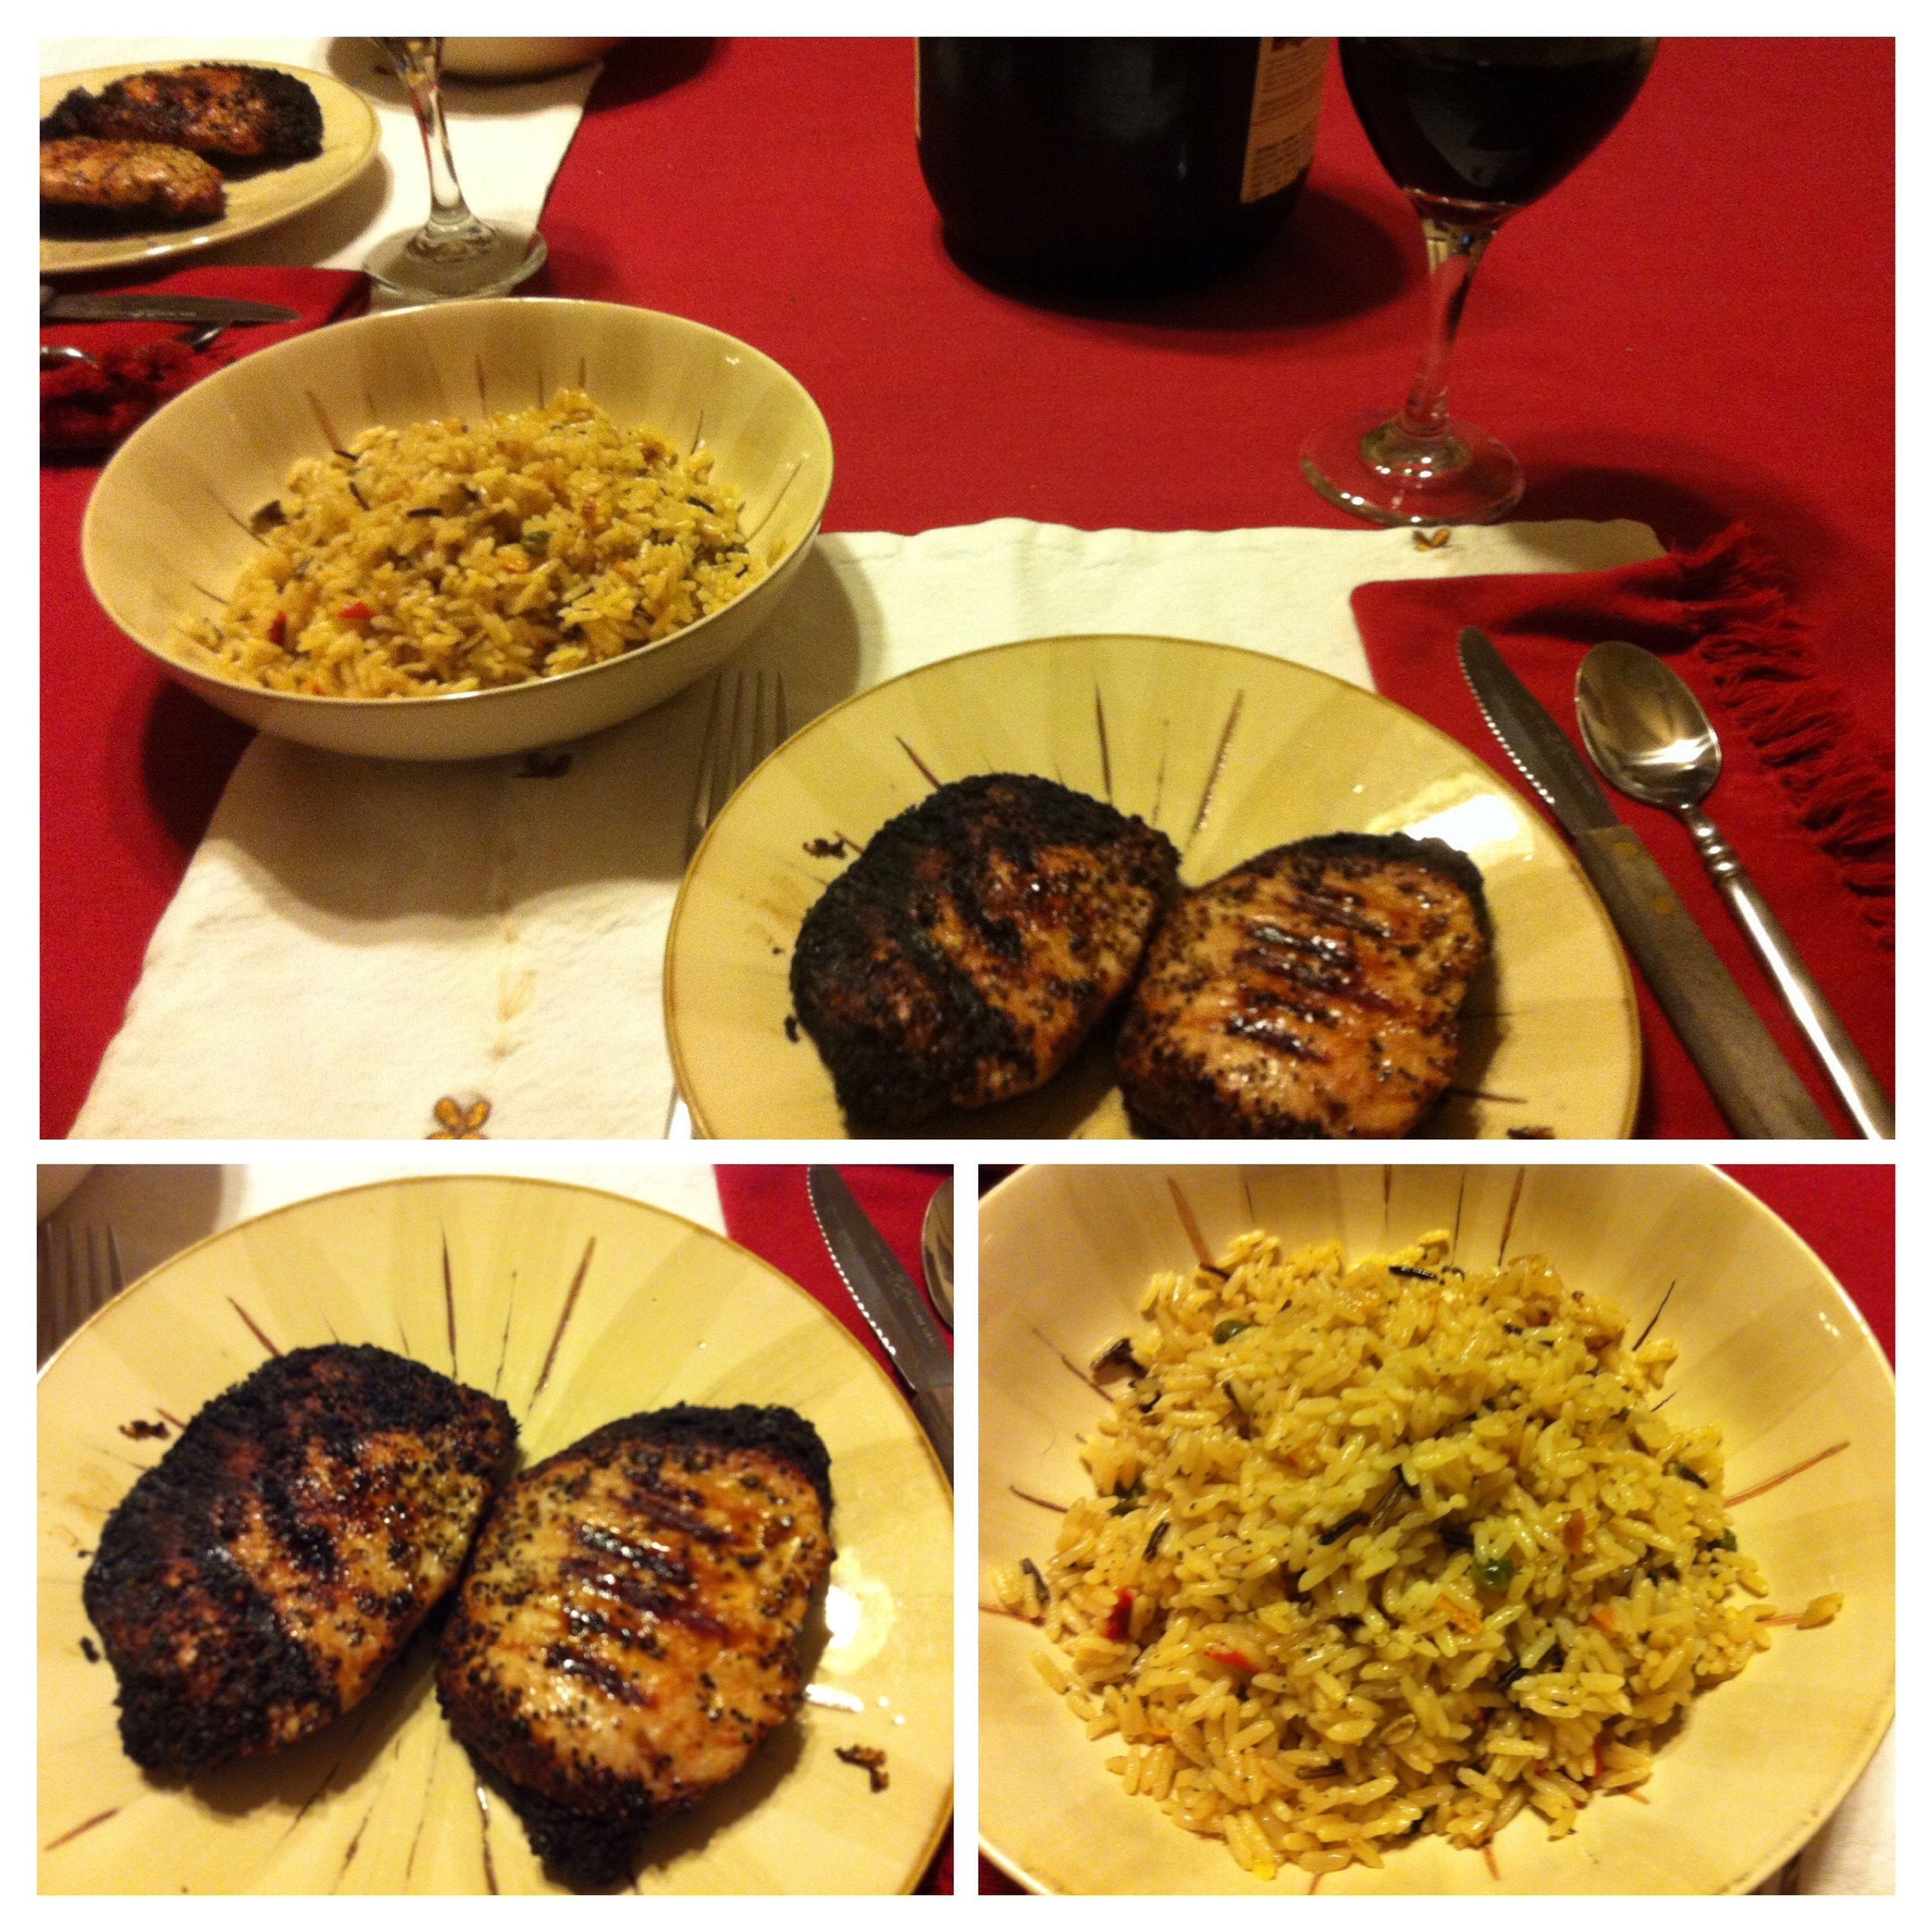 Grilled boneless pork chops last night. Served them with spanish rice and my homemade 2012 Californian Burgundy wine. ICanCookMyAssOff Nomnombomb TheExpensiveWinos MyFoodPics